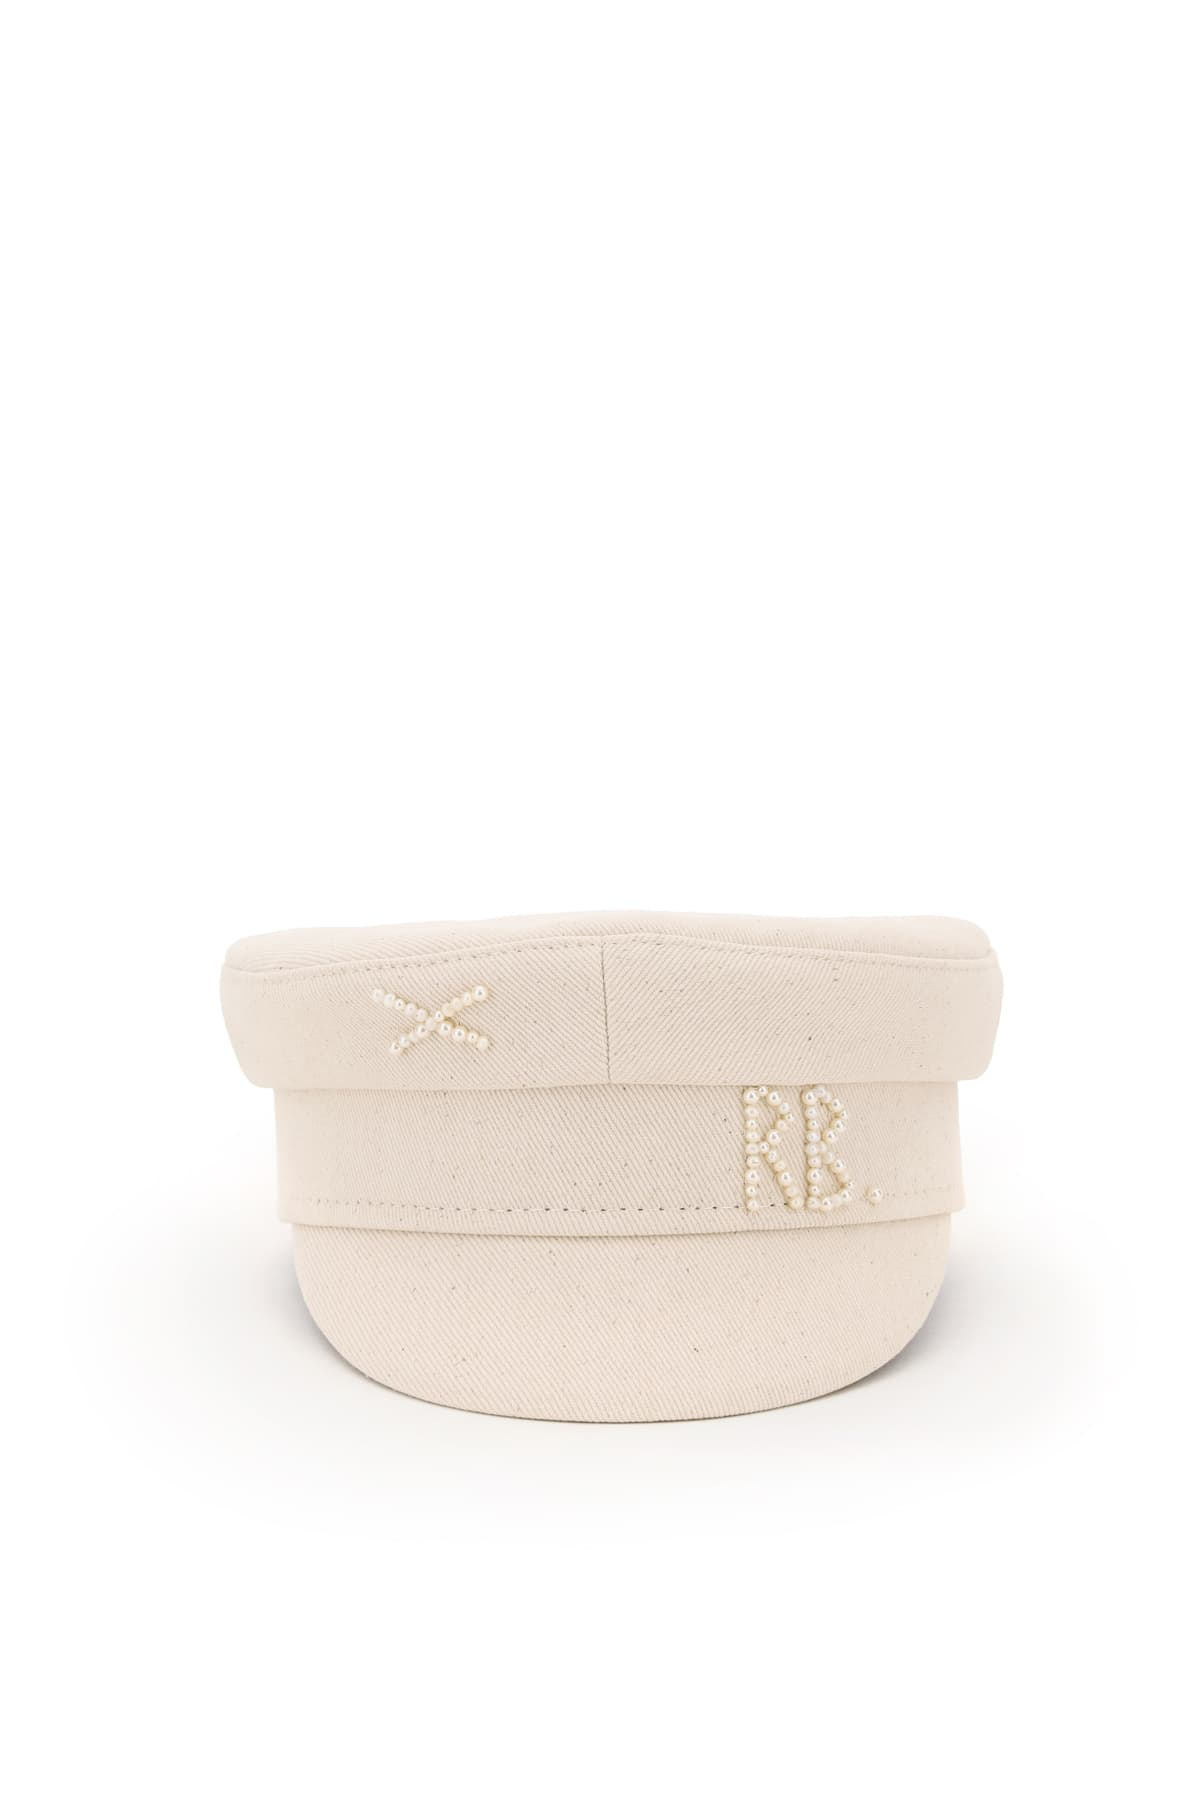 Ruslan Baginskiy Baker Boy Hat Rb Beads